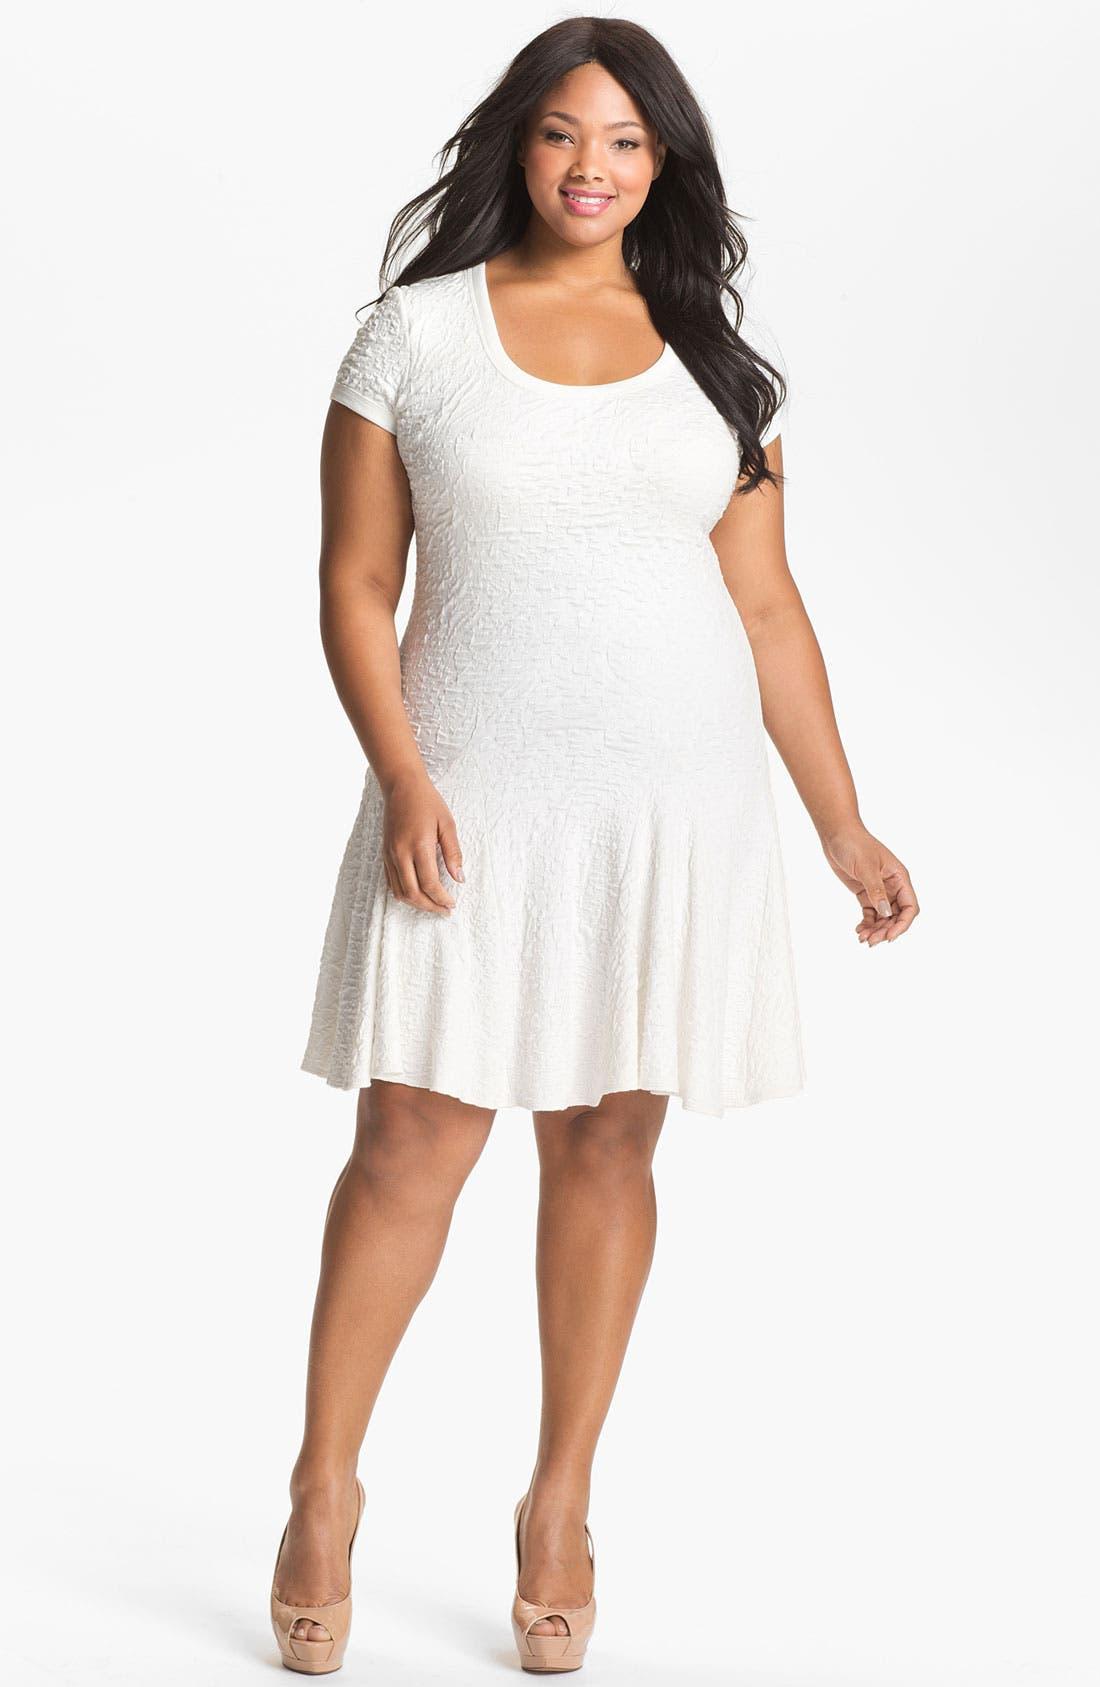 Main Image - A.B.S. by Allen Schwartz Textured Drop Waist Dress (Plus Size) (Online Only)